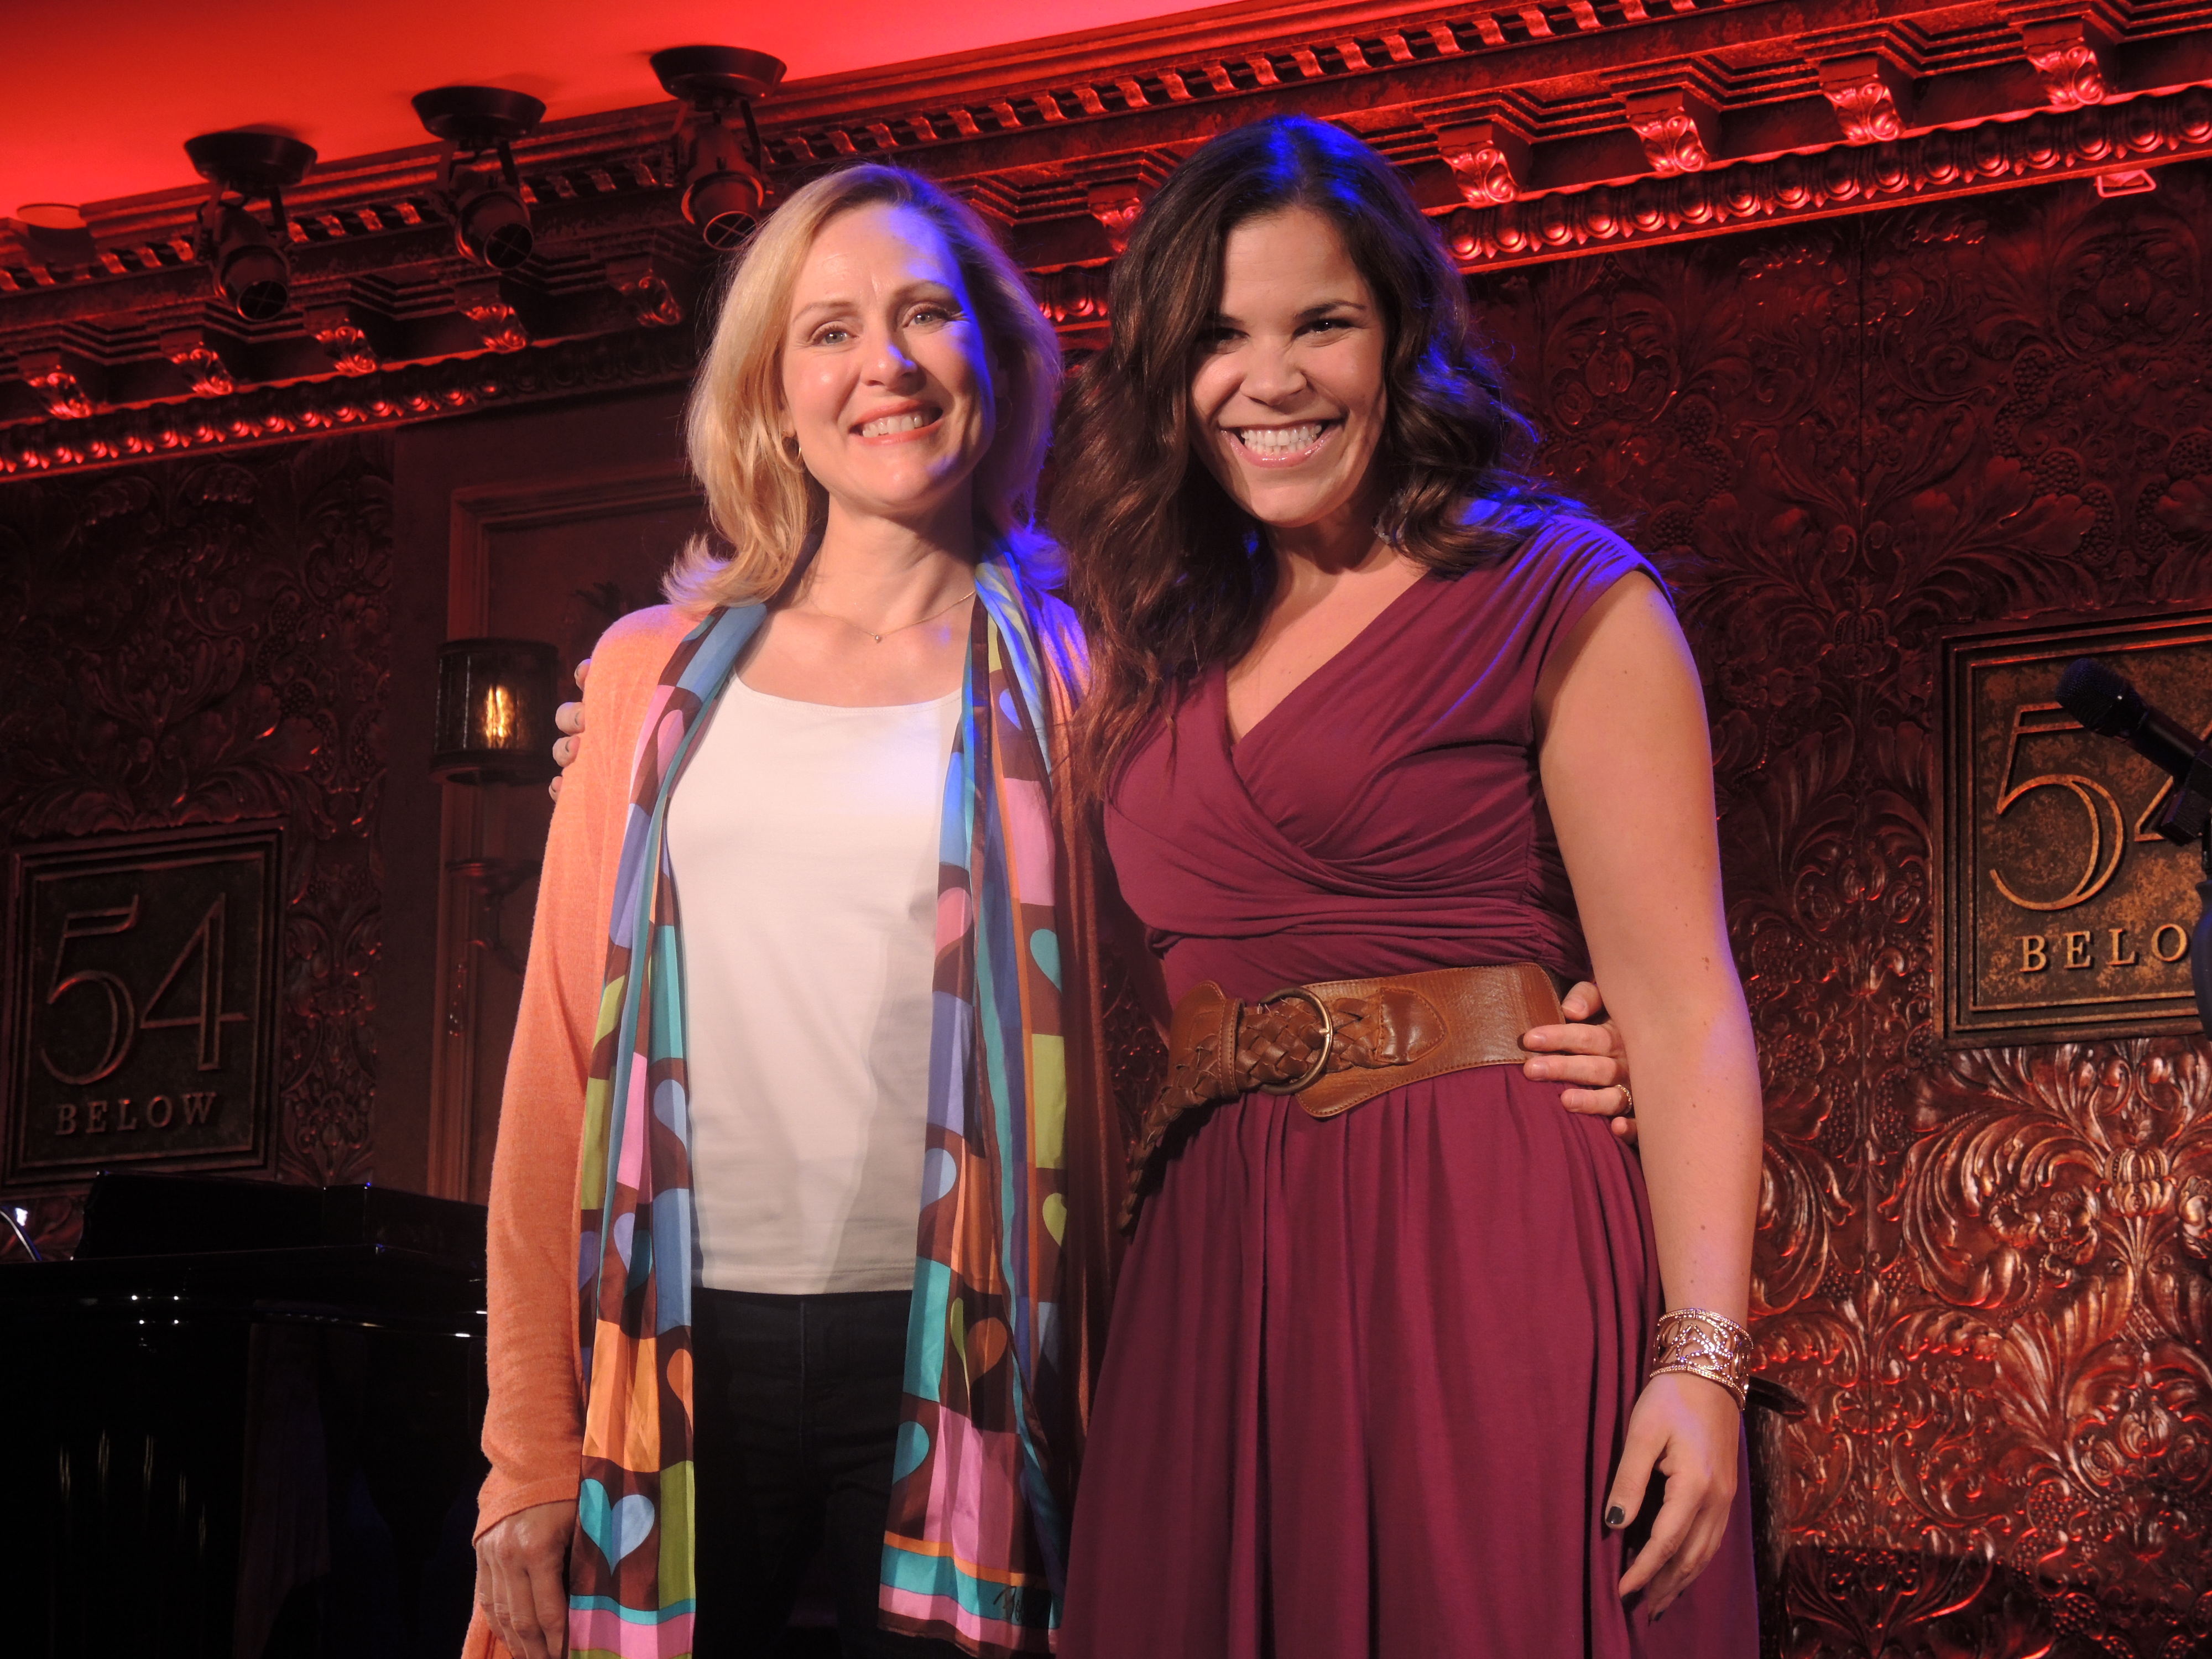 Class Reunion with Princesses – Sierra Boggess,Lindsay Mendez, Donna English & Brent Barrett (video)